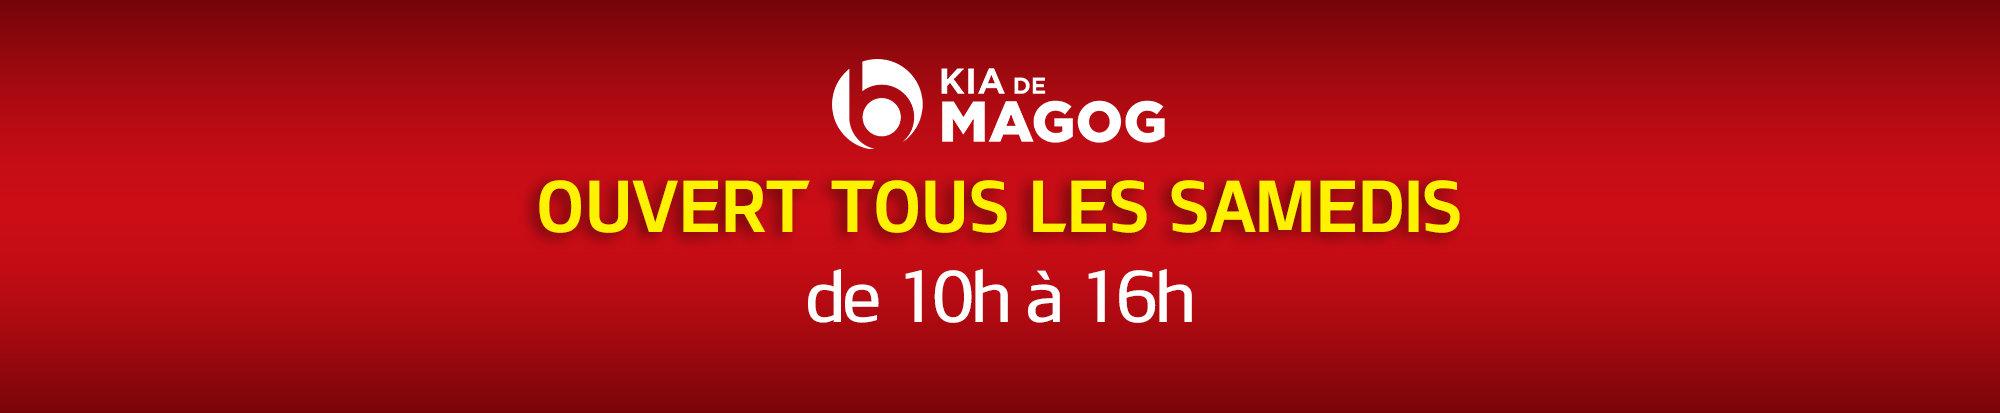 Kia Magog est maintenant ouvert tous les samedis!